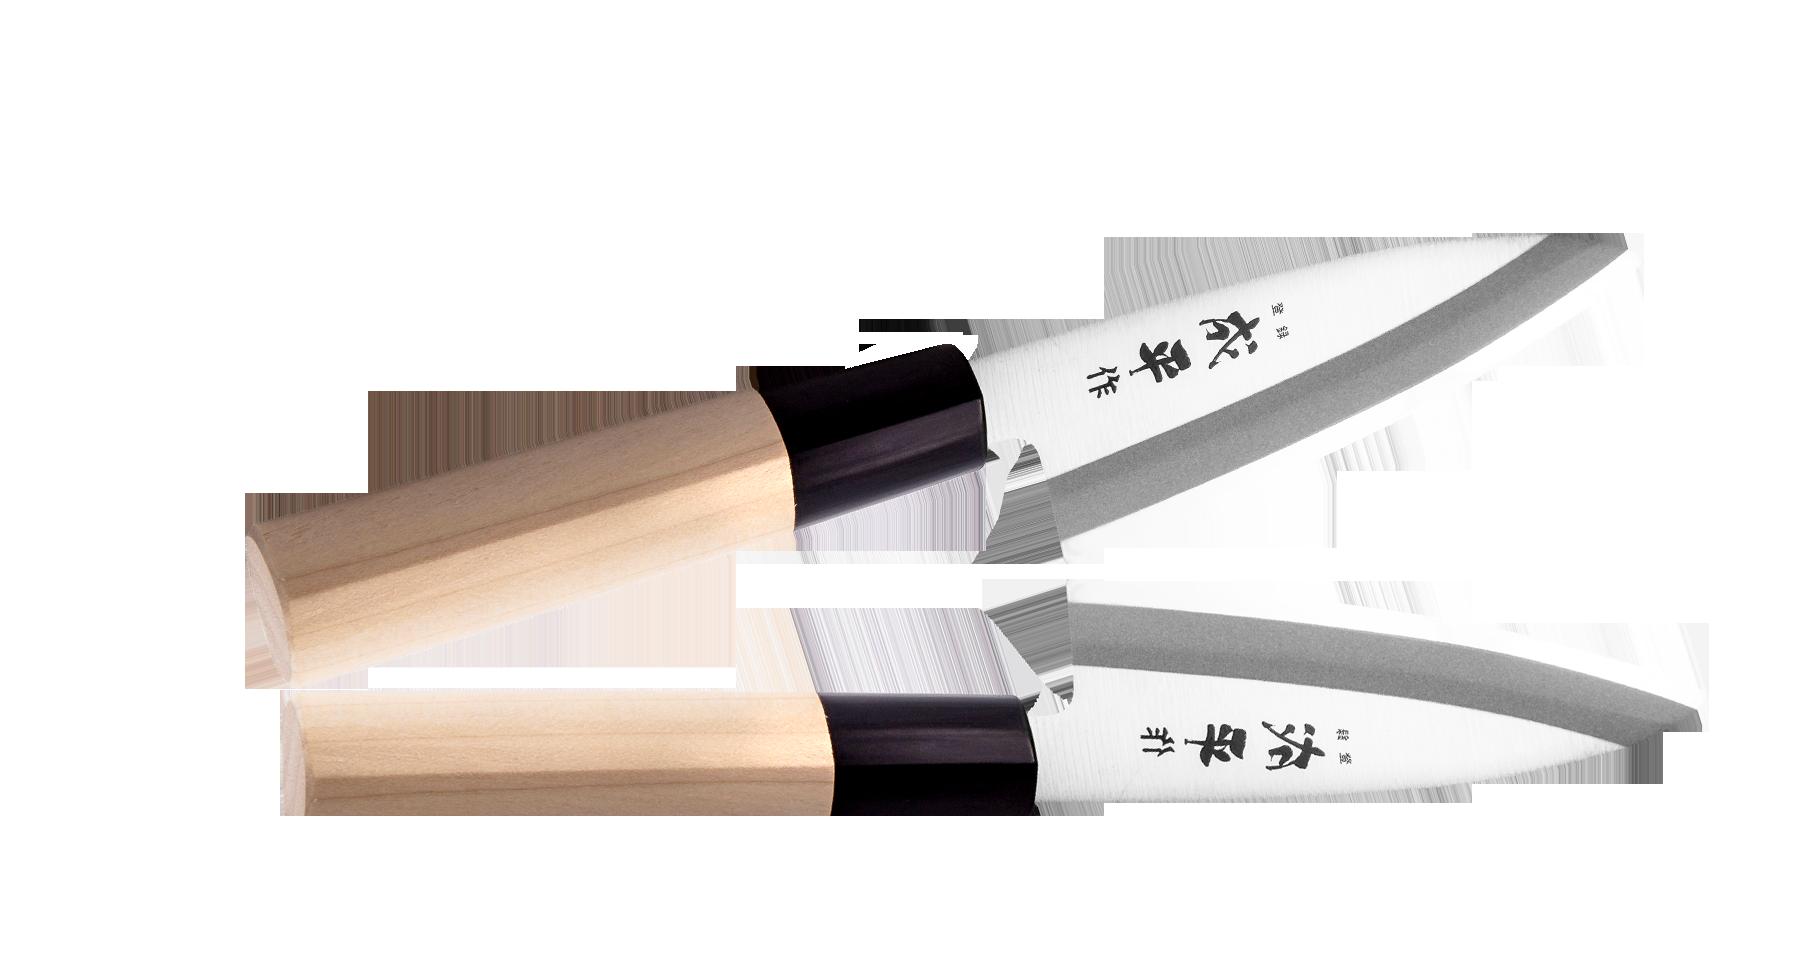 Фото - Нож Деба Narihira Tojiro 105 мм, сталь AUS-8, рукоять дерево кухонные ножи